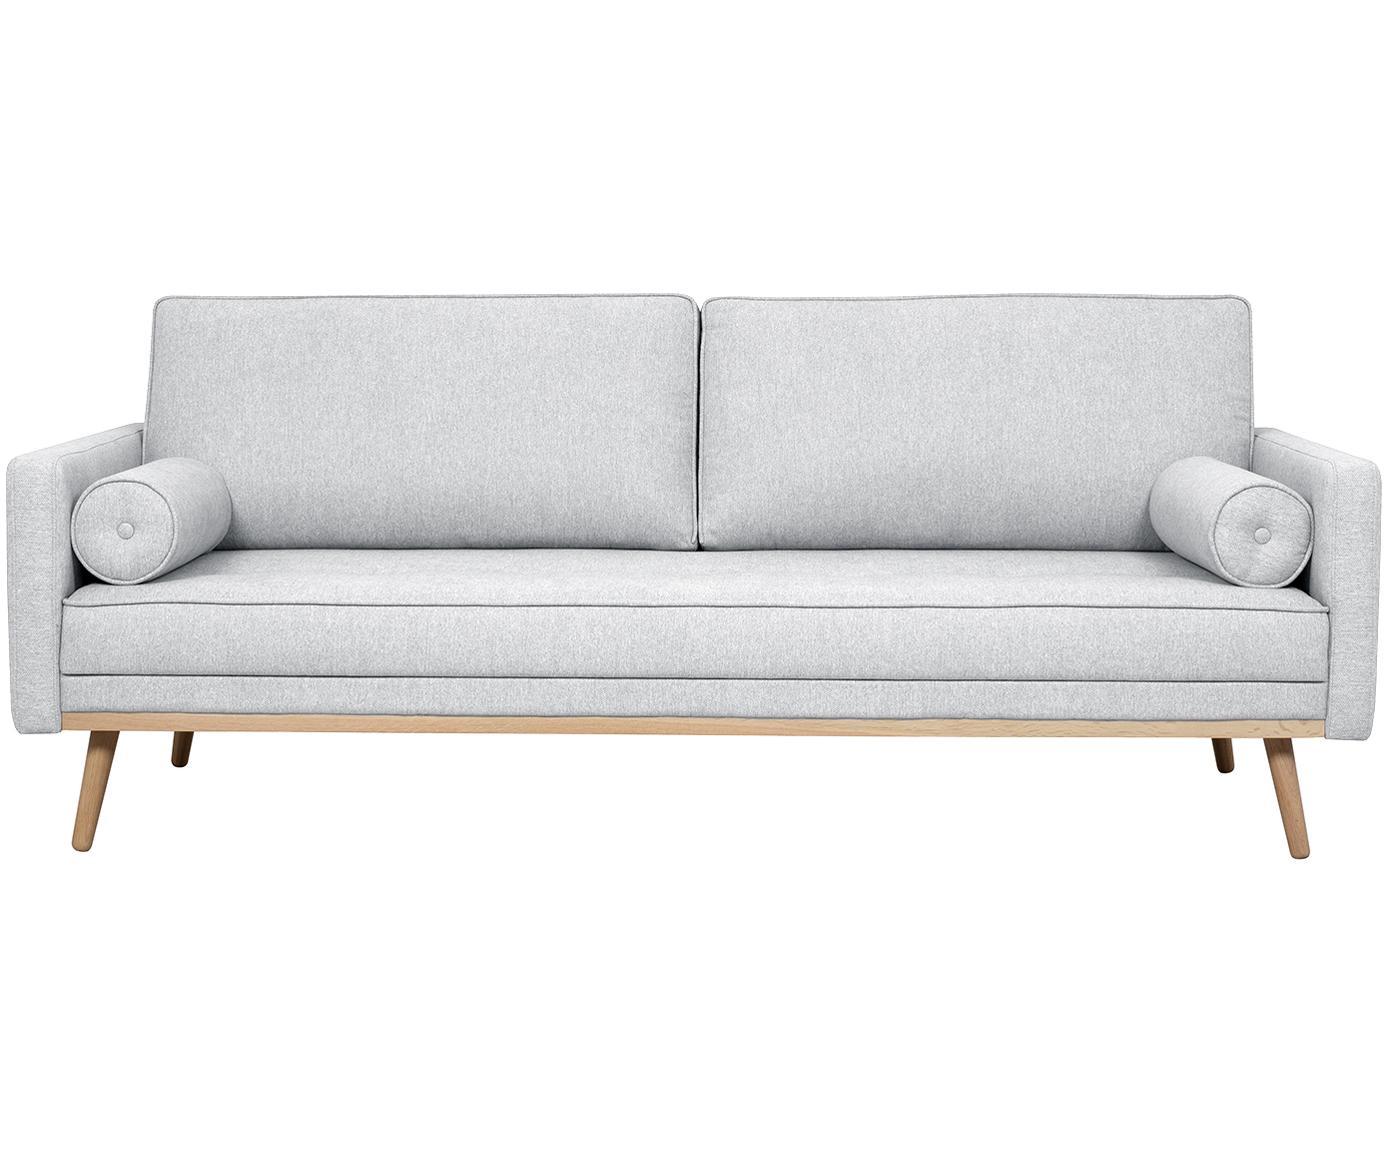 Sofa Saint (3-Sitzer), Bezug: Polyester 50.000 Scheuert, Gestell: Massives Kiefernholz, Spa, Webstoff Hellgrau, 210 x 70 cm